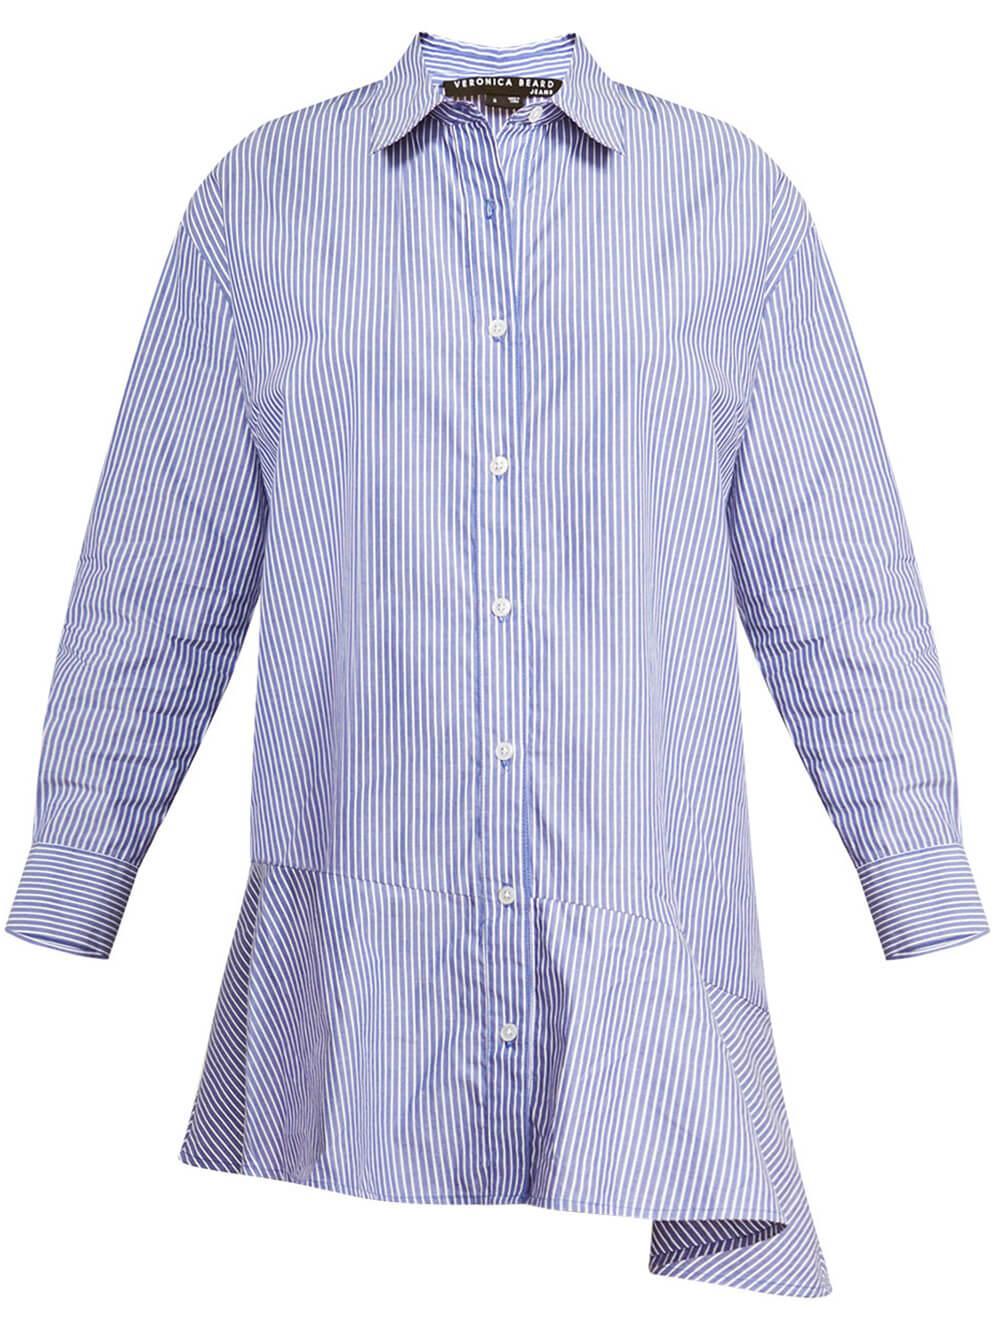 Gilda Striped Shirt Item # 2108SH1240077